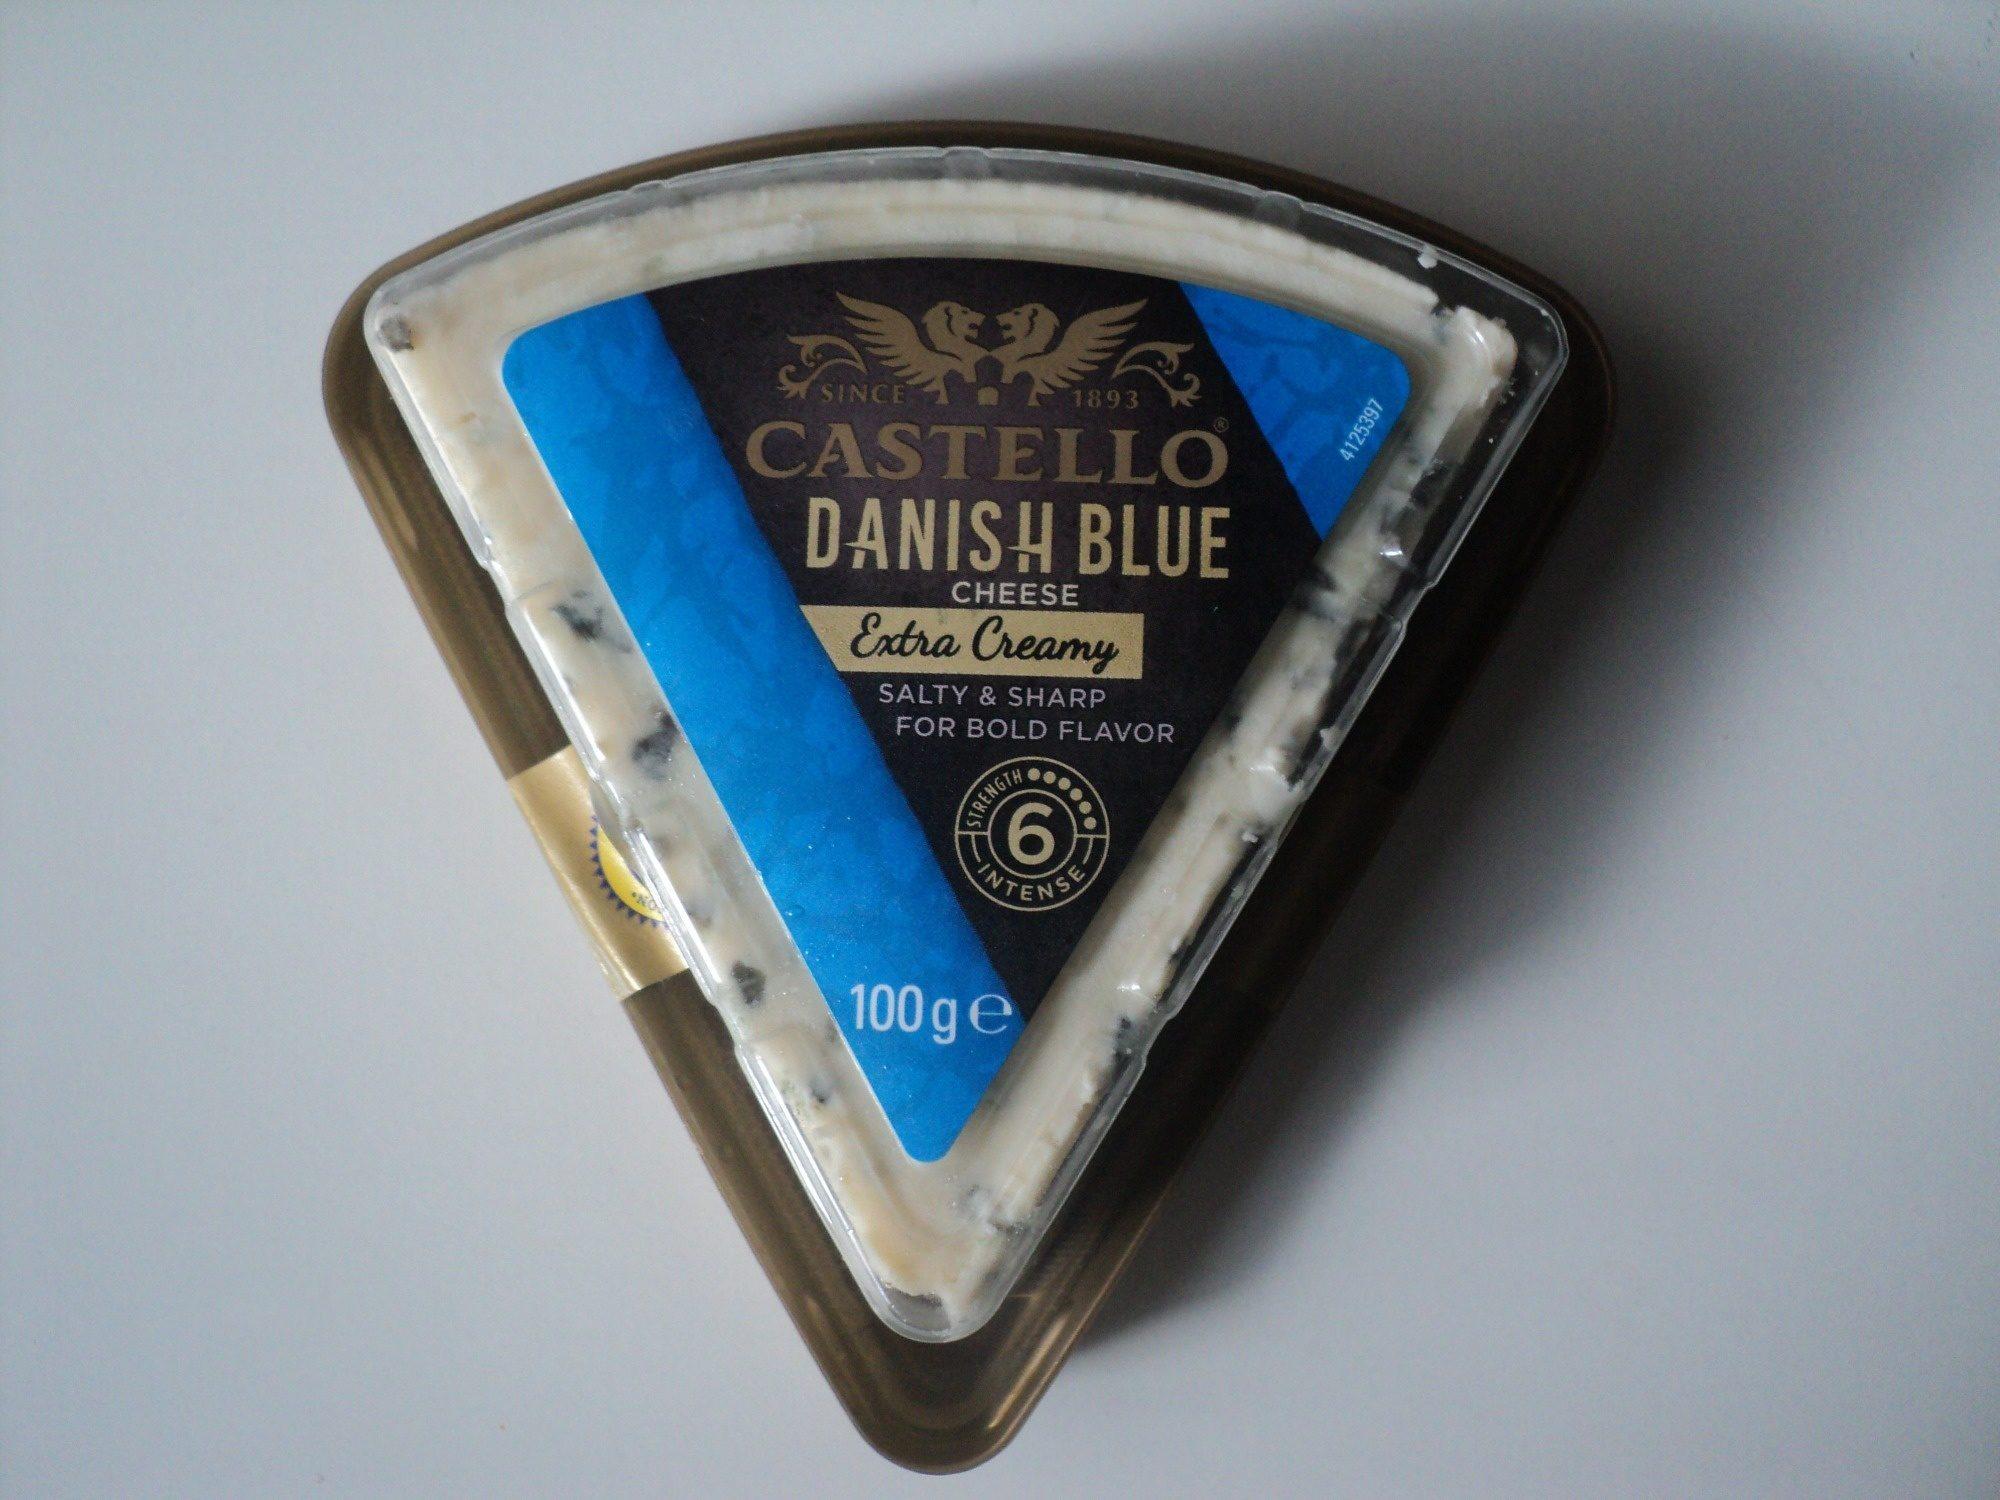 Castello Danish Blue cheese - Product - ro